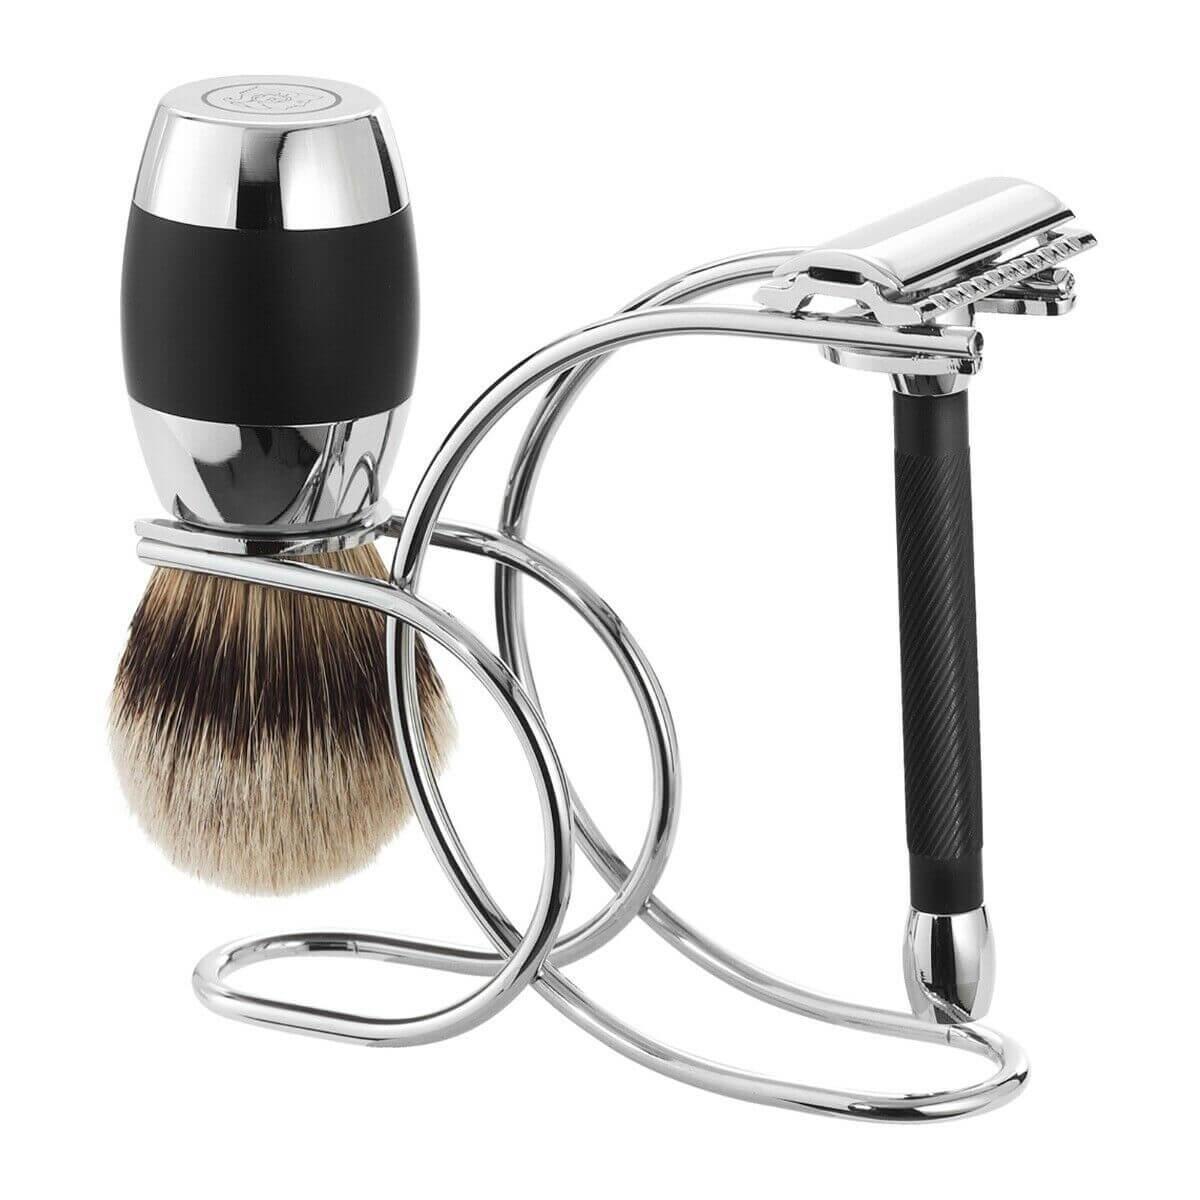 Merkur Shaving Set 90 2081 001